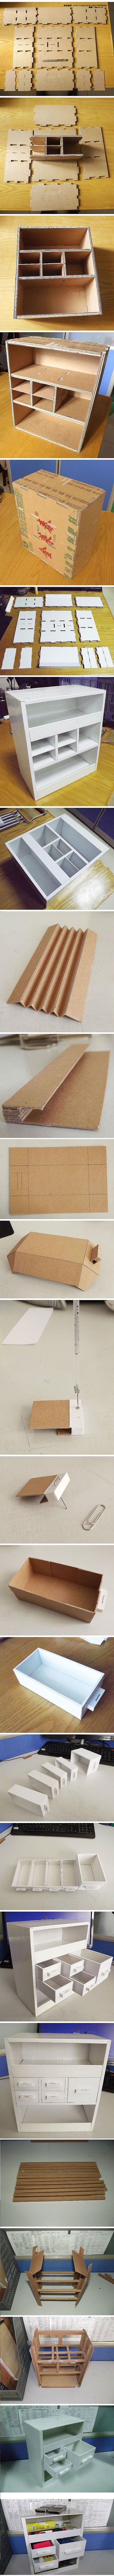 WOW! Box - exquisite handmade DIY                                                                                                                                                                                 Más